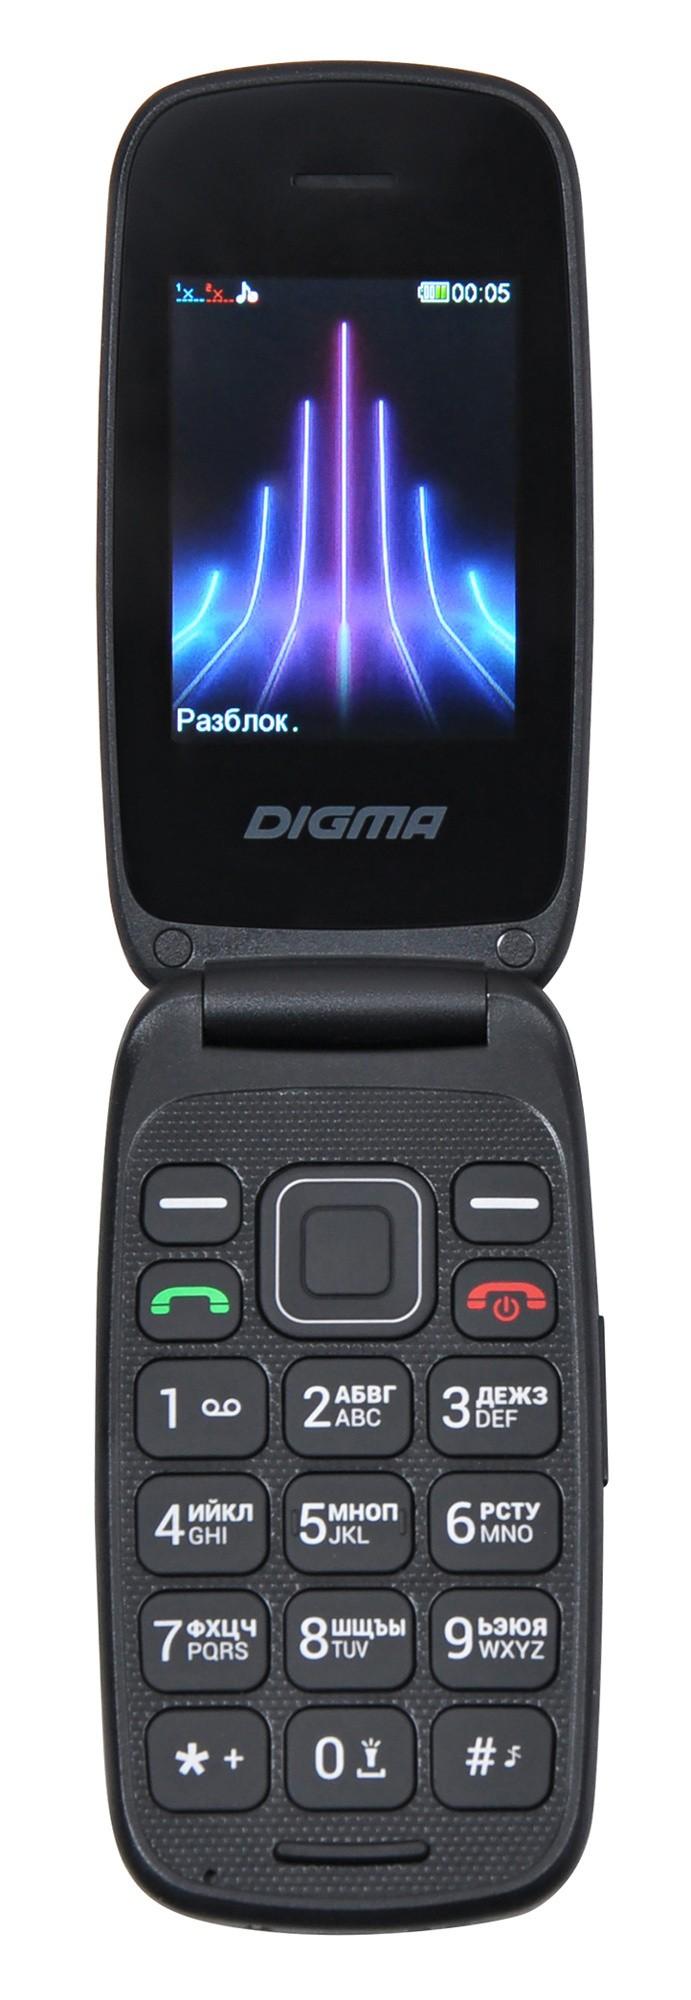 Digma Vox A245